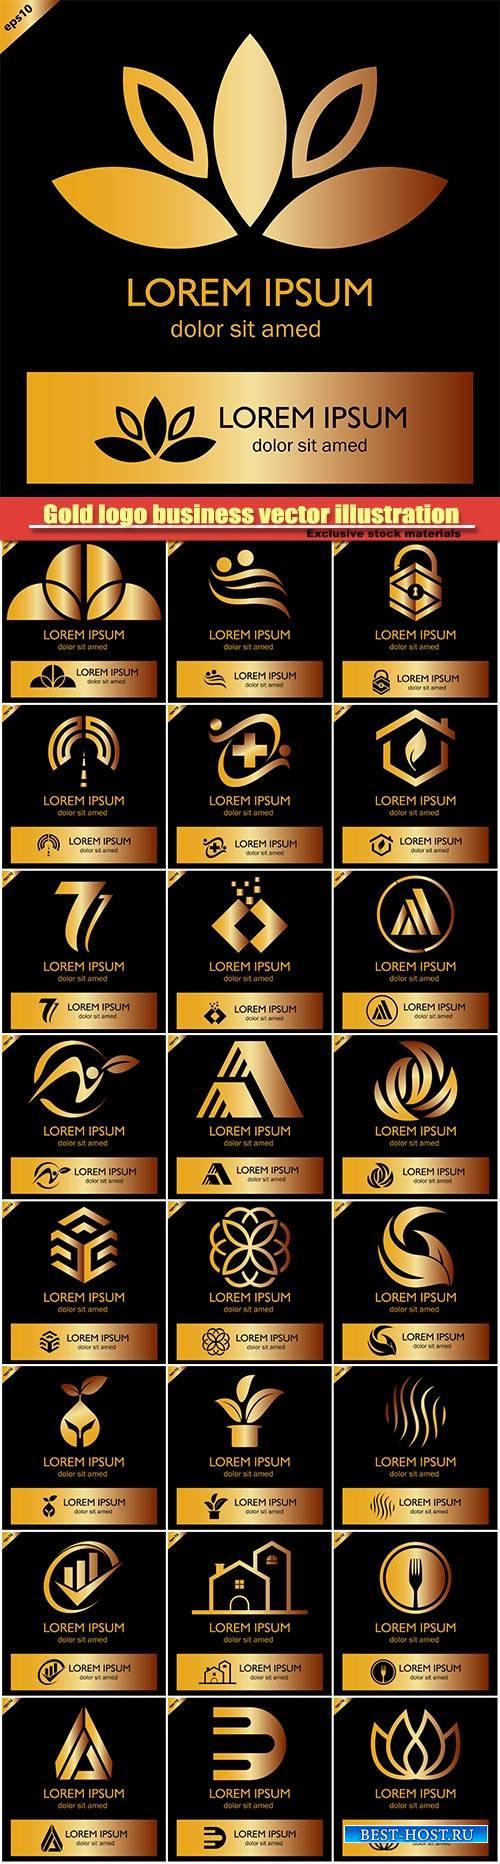 Gold logo business vector illustration #10